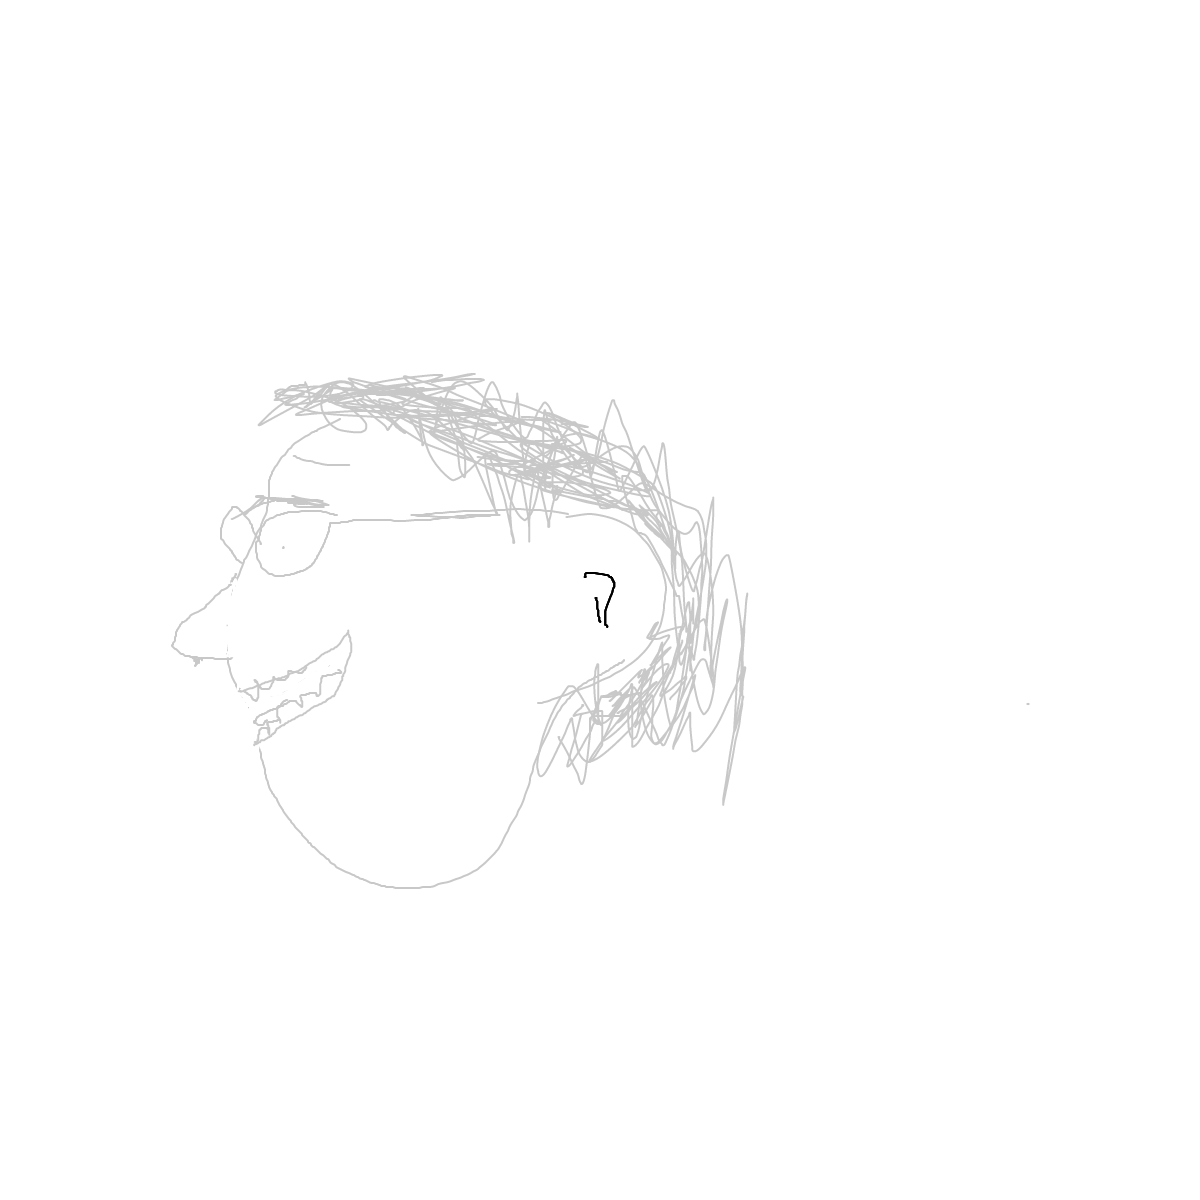 BAAAM drawing#17355 lat:51.2067413330078100lng: 3.2589967250823975